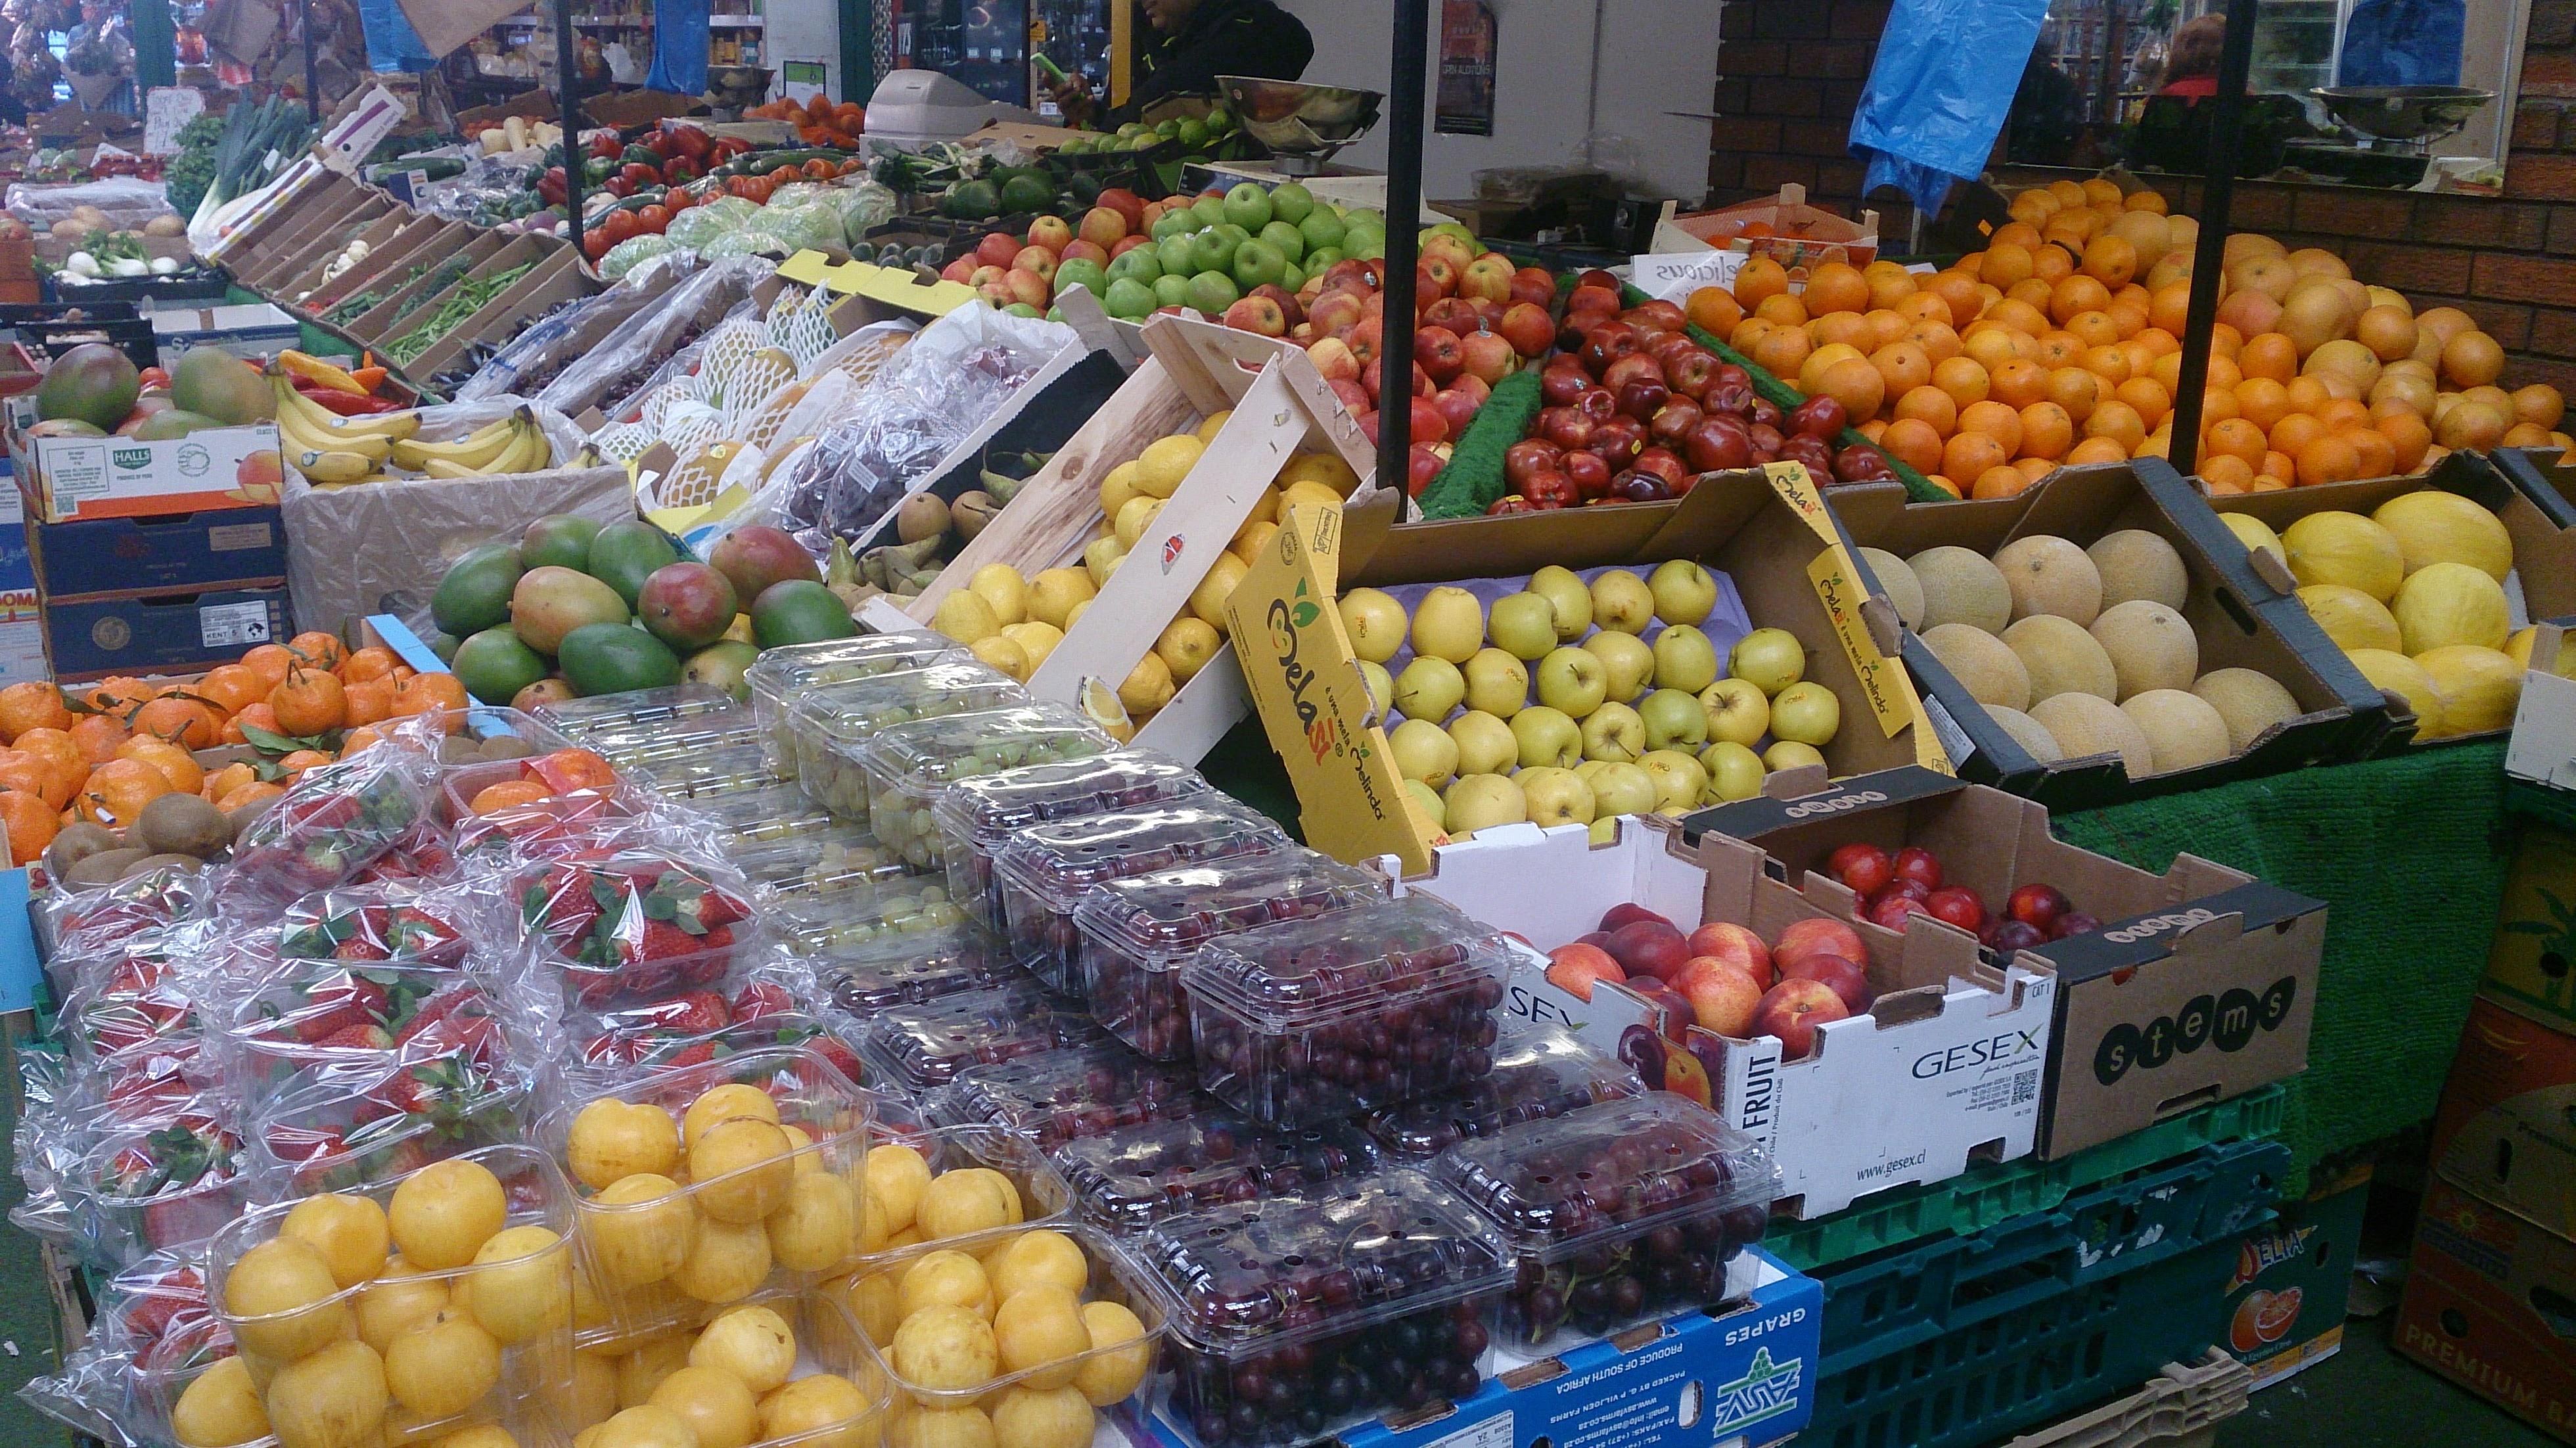 Cobby's Fruit and Veg